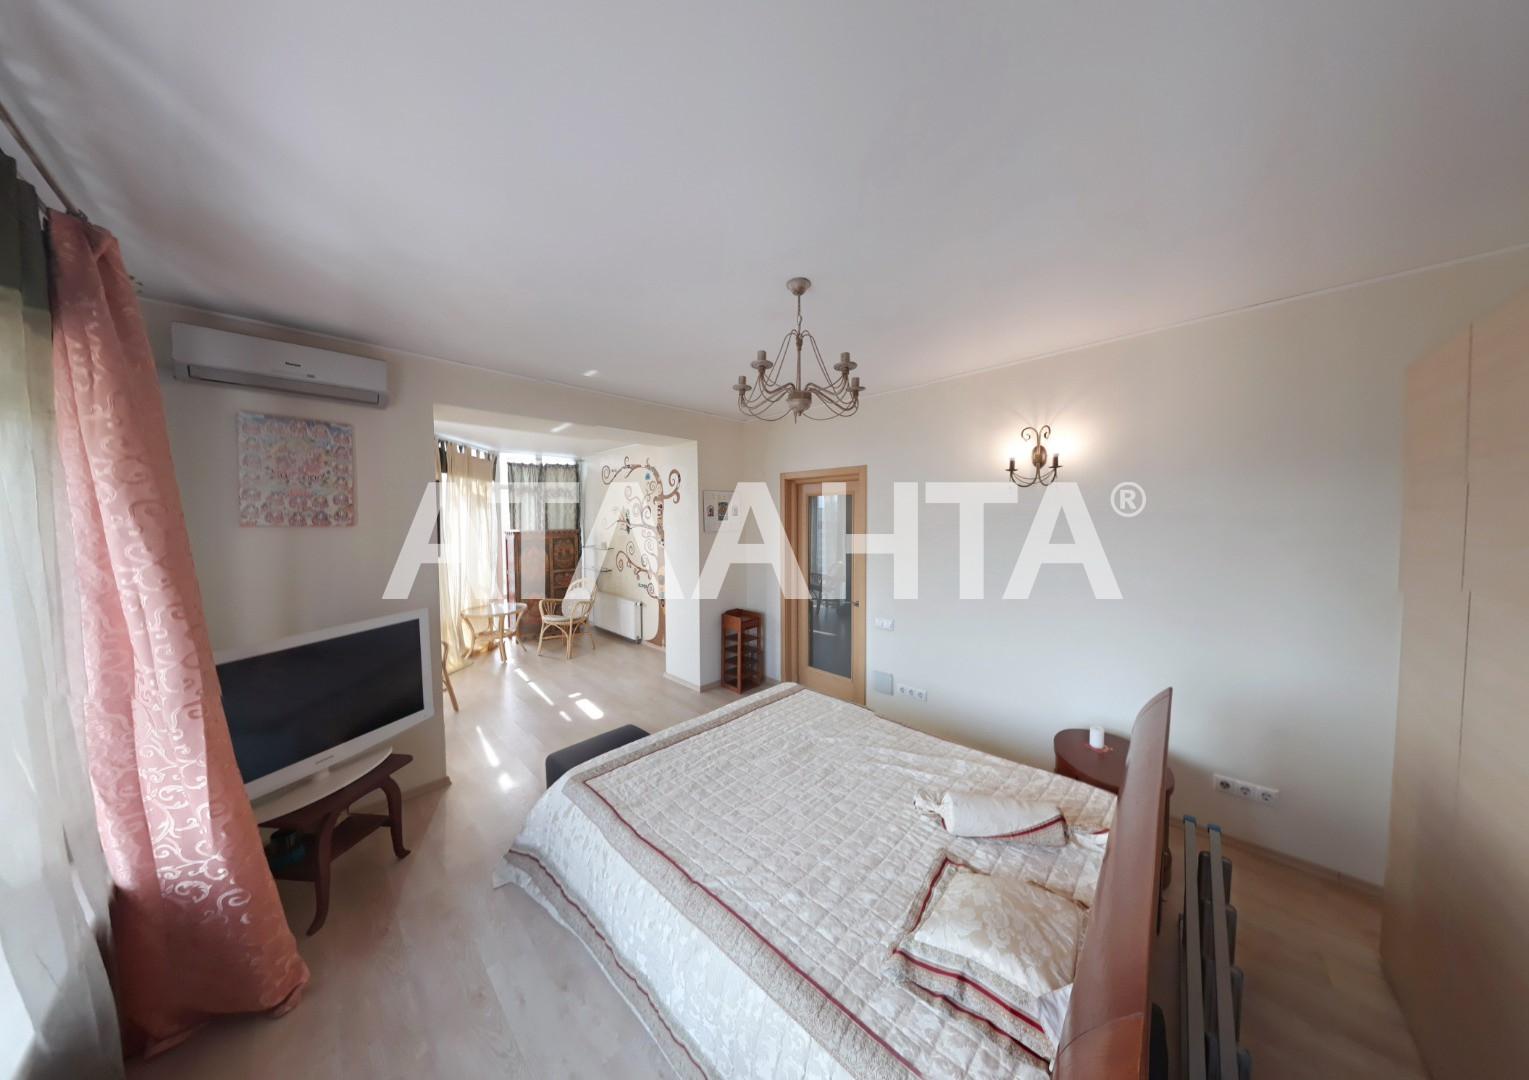 Продается 3-комнатная Квартира на ул. Ломоносова — 118 900 у.е. (фото №15)